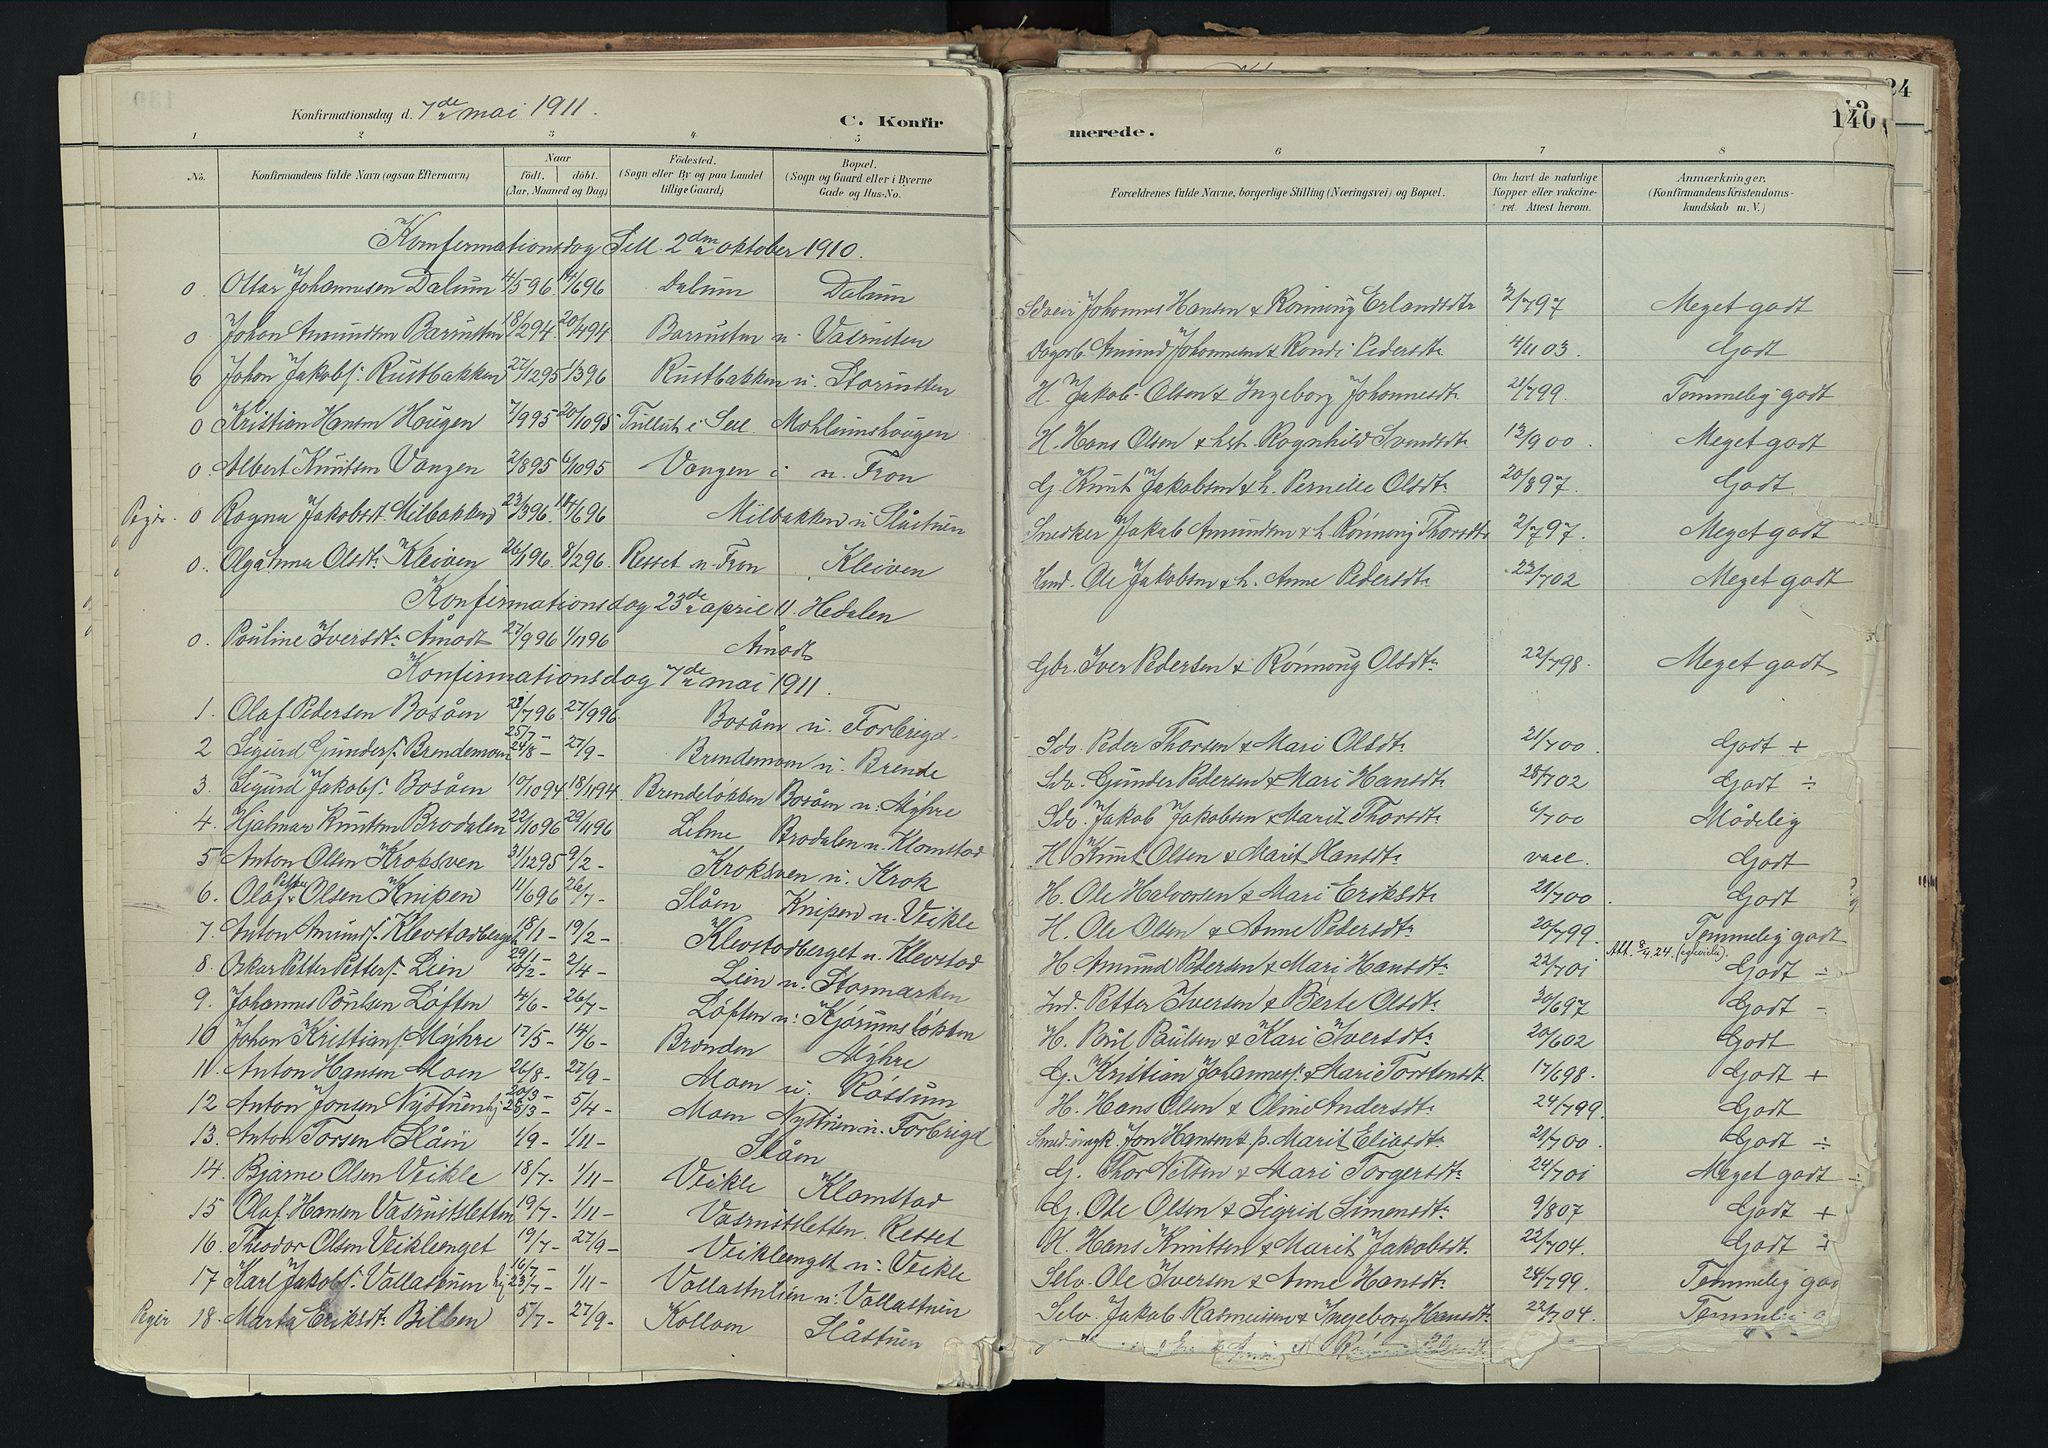 SAH, Nord-Fron prestekontor, Ministerialbok nr. 3, 1884-1914, s. 140